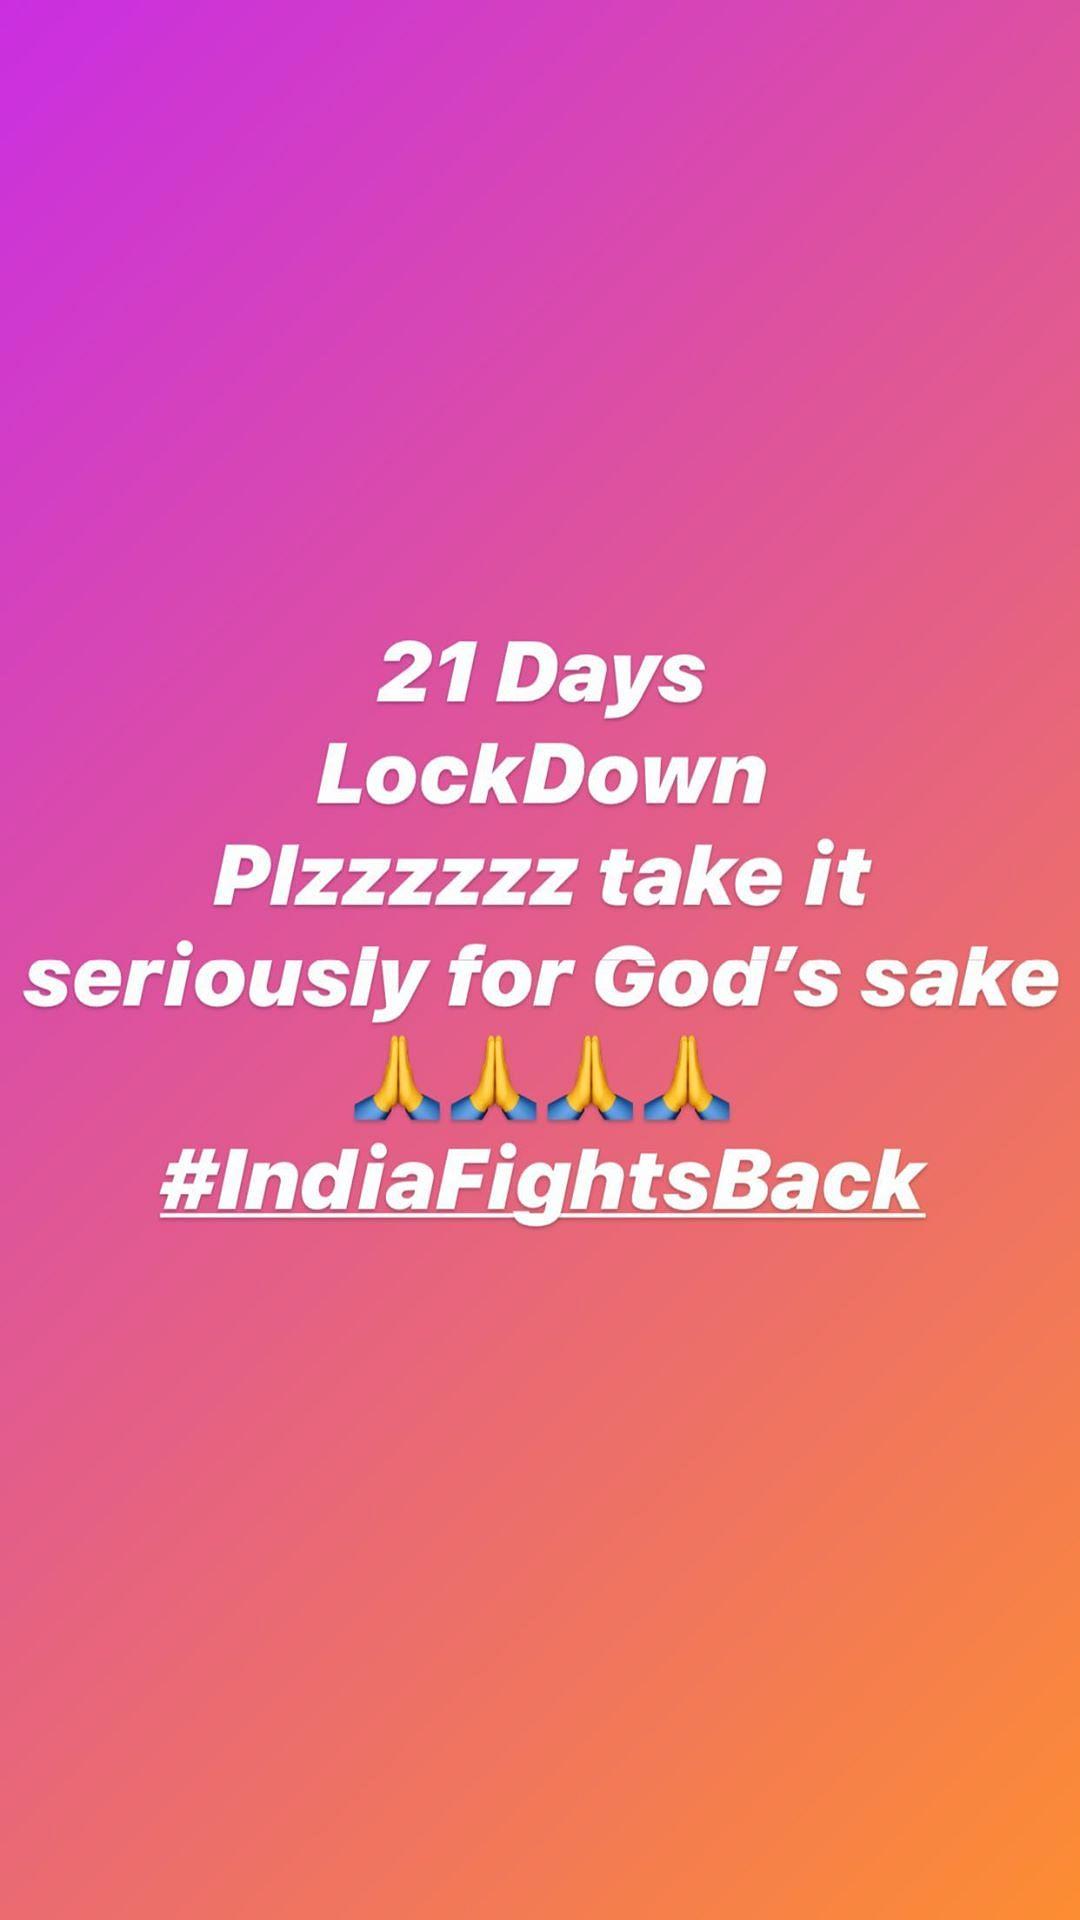 Take It Seriously: Sidharth Shukla, Hina Khan on 21-Day Lockdown